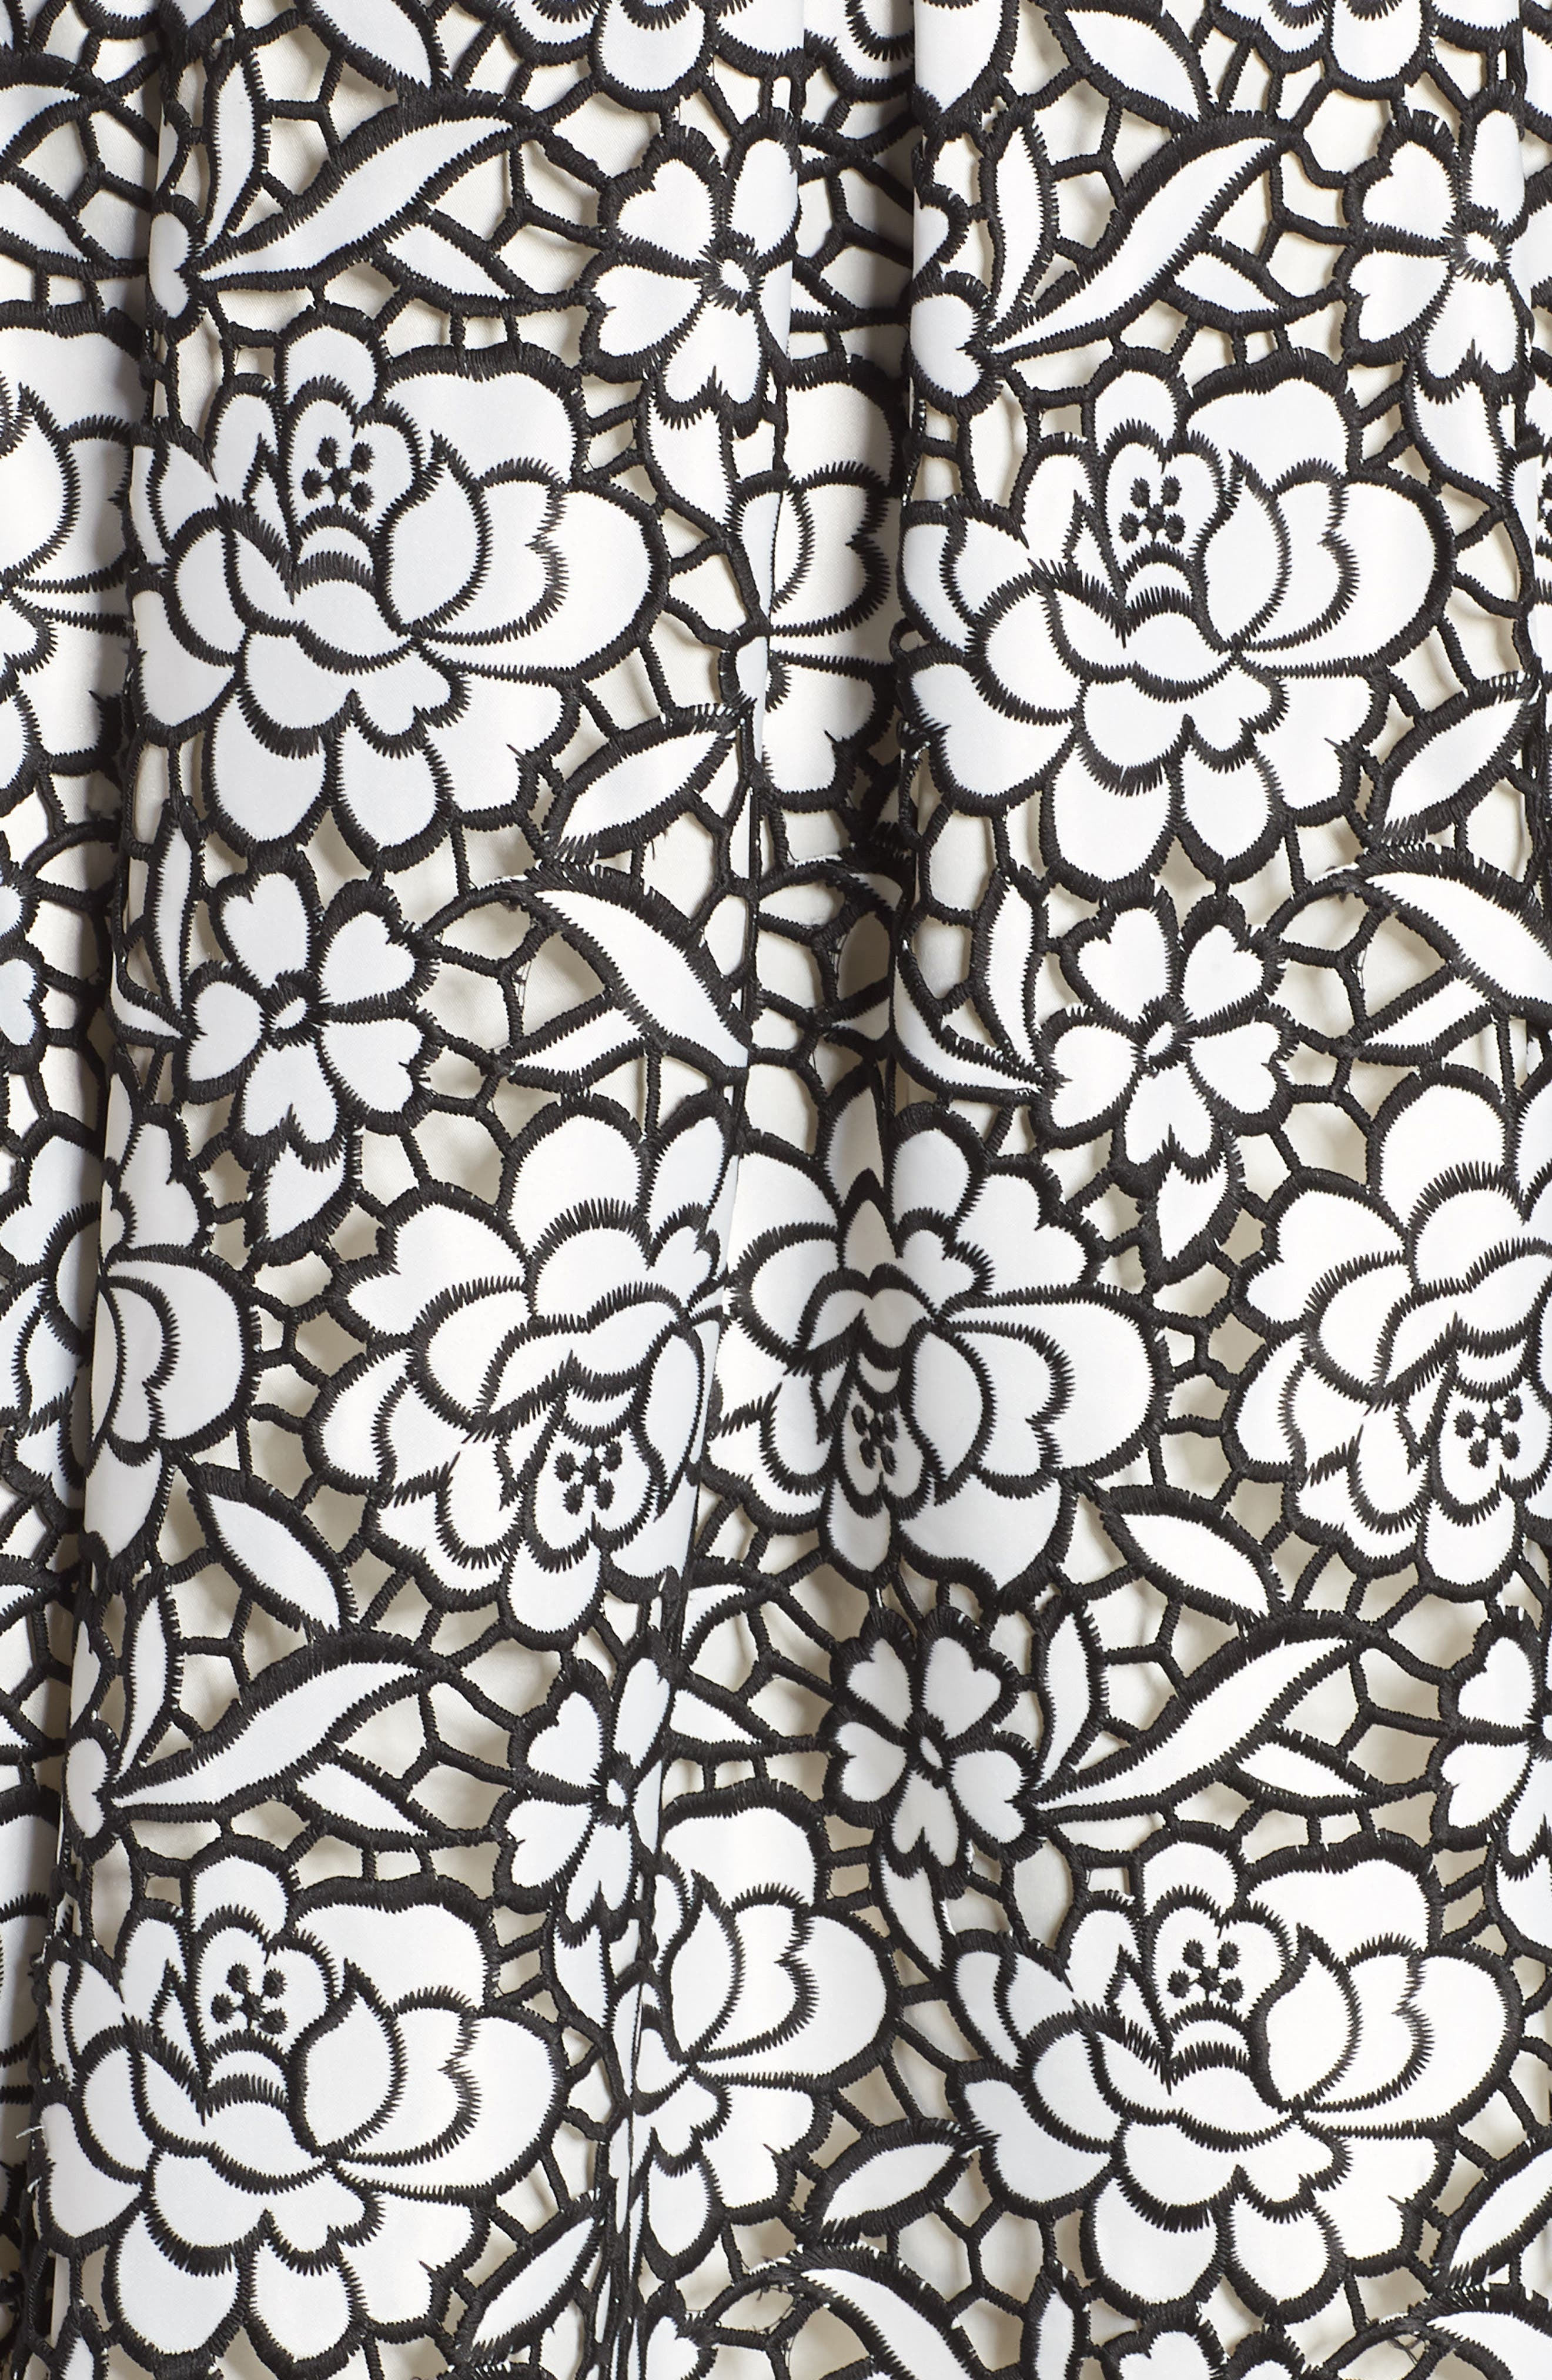 Pleated Floral Cutout Appliqué Skirt,                             Alternate thumbnail 5, color,                             BLACK/IVORY